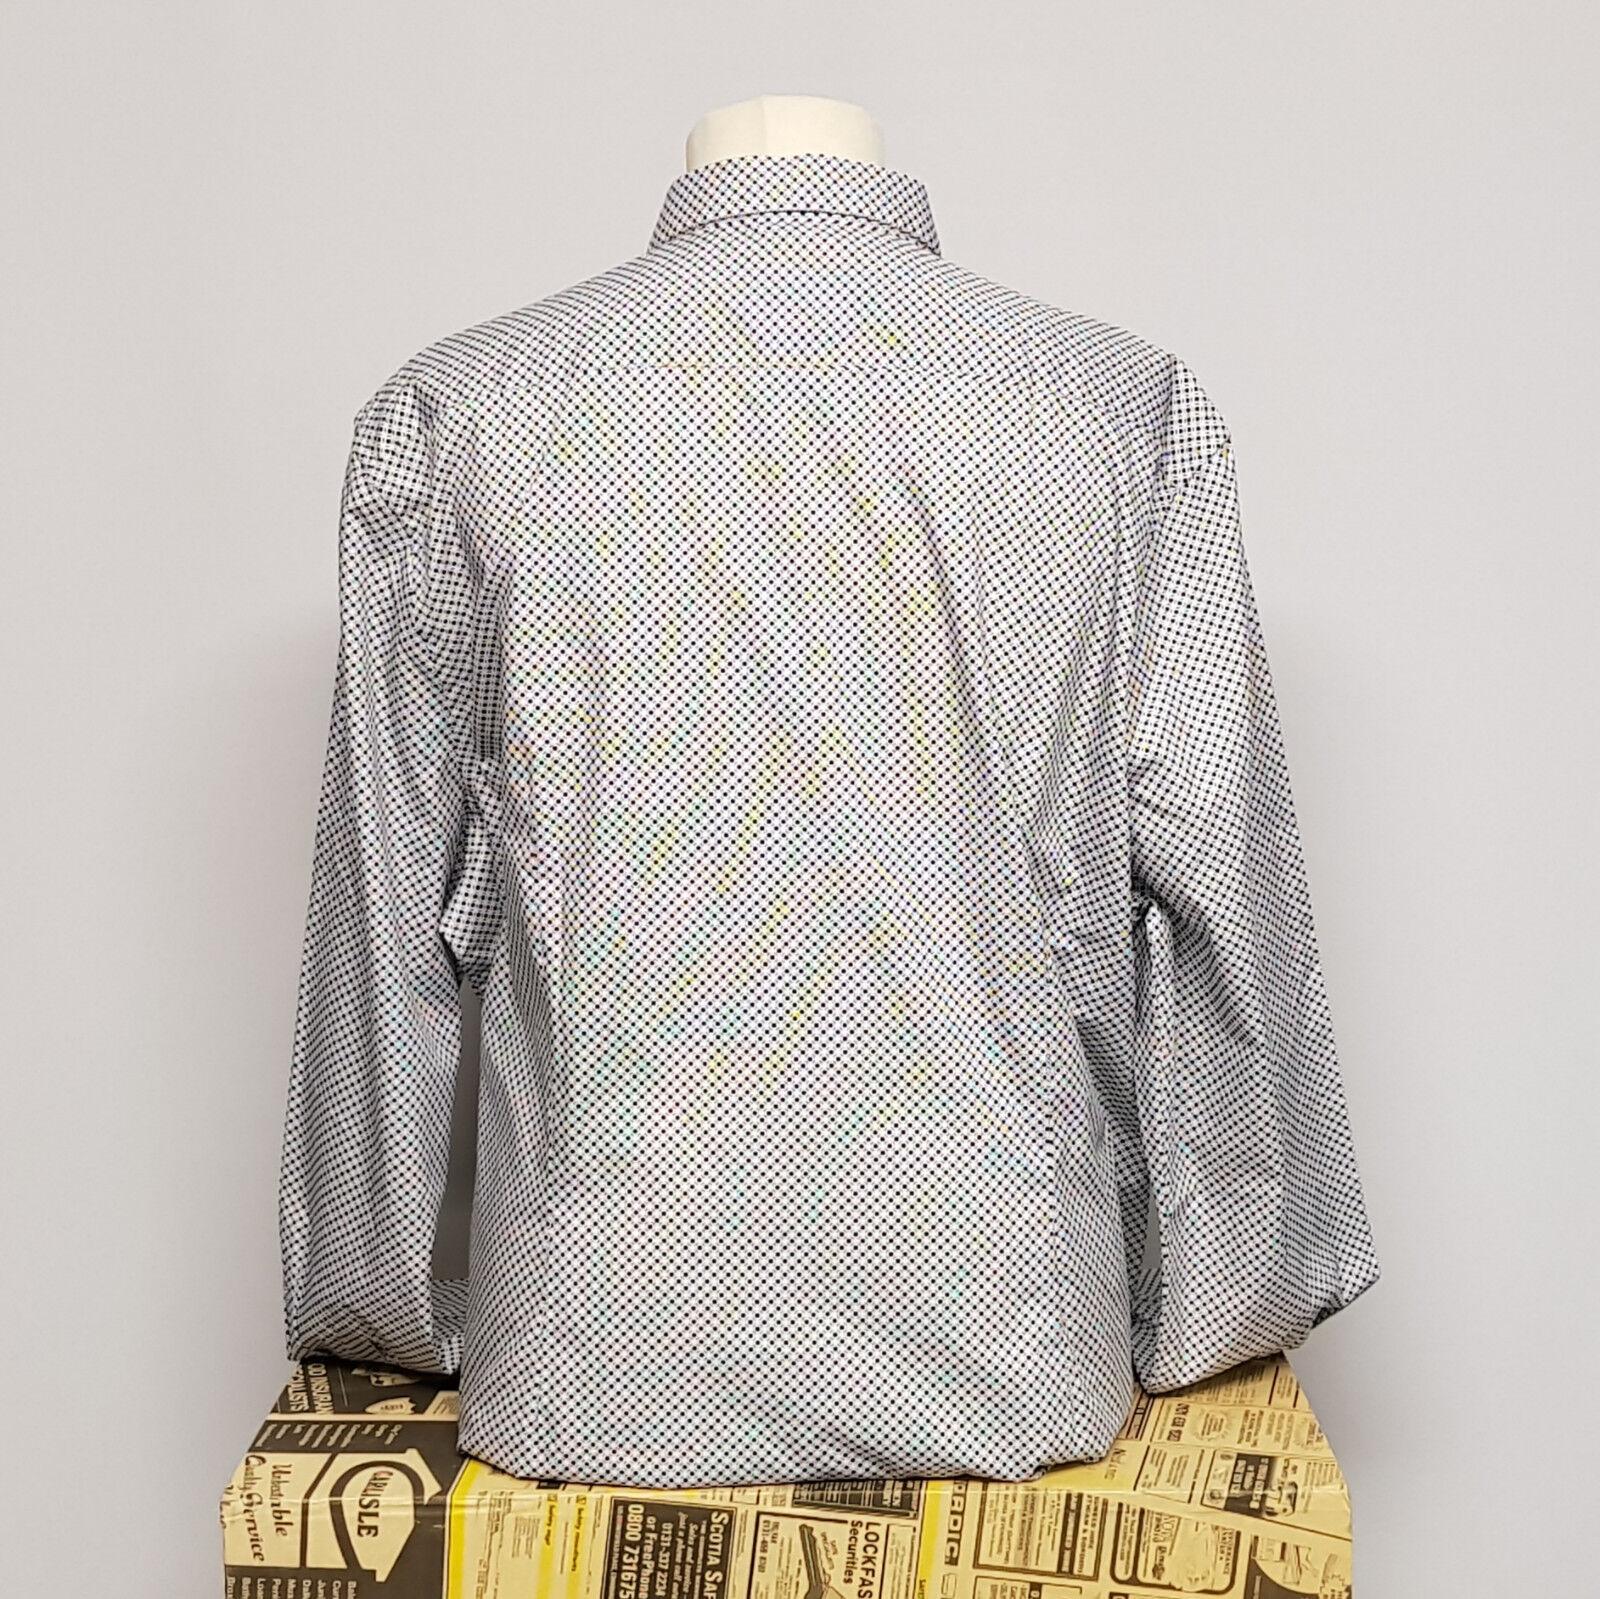 Ben Sherman 1 1 Shirt Slim Fit Soho Dark Dark Dark Navy 0047990 Herrenhemd blau weiß XXL | Haltbar  e6303d